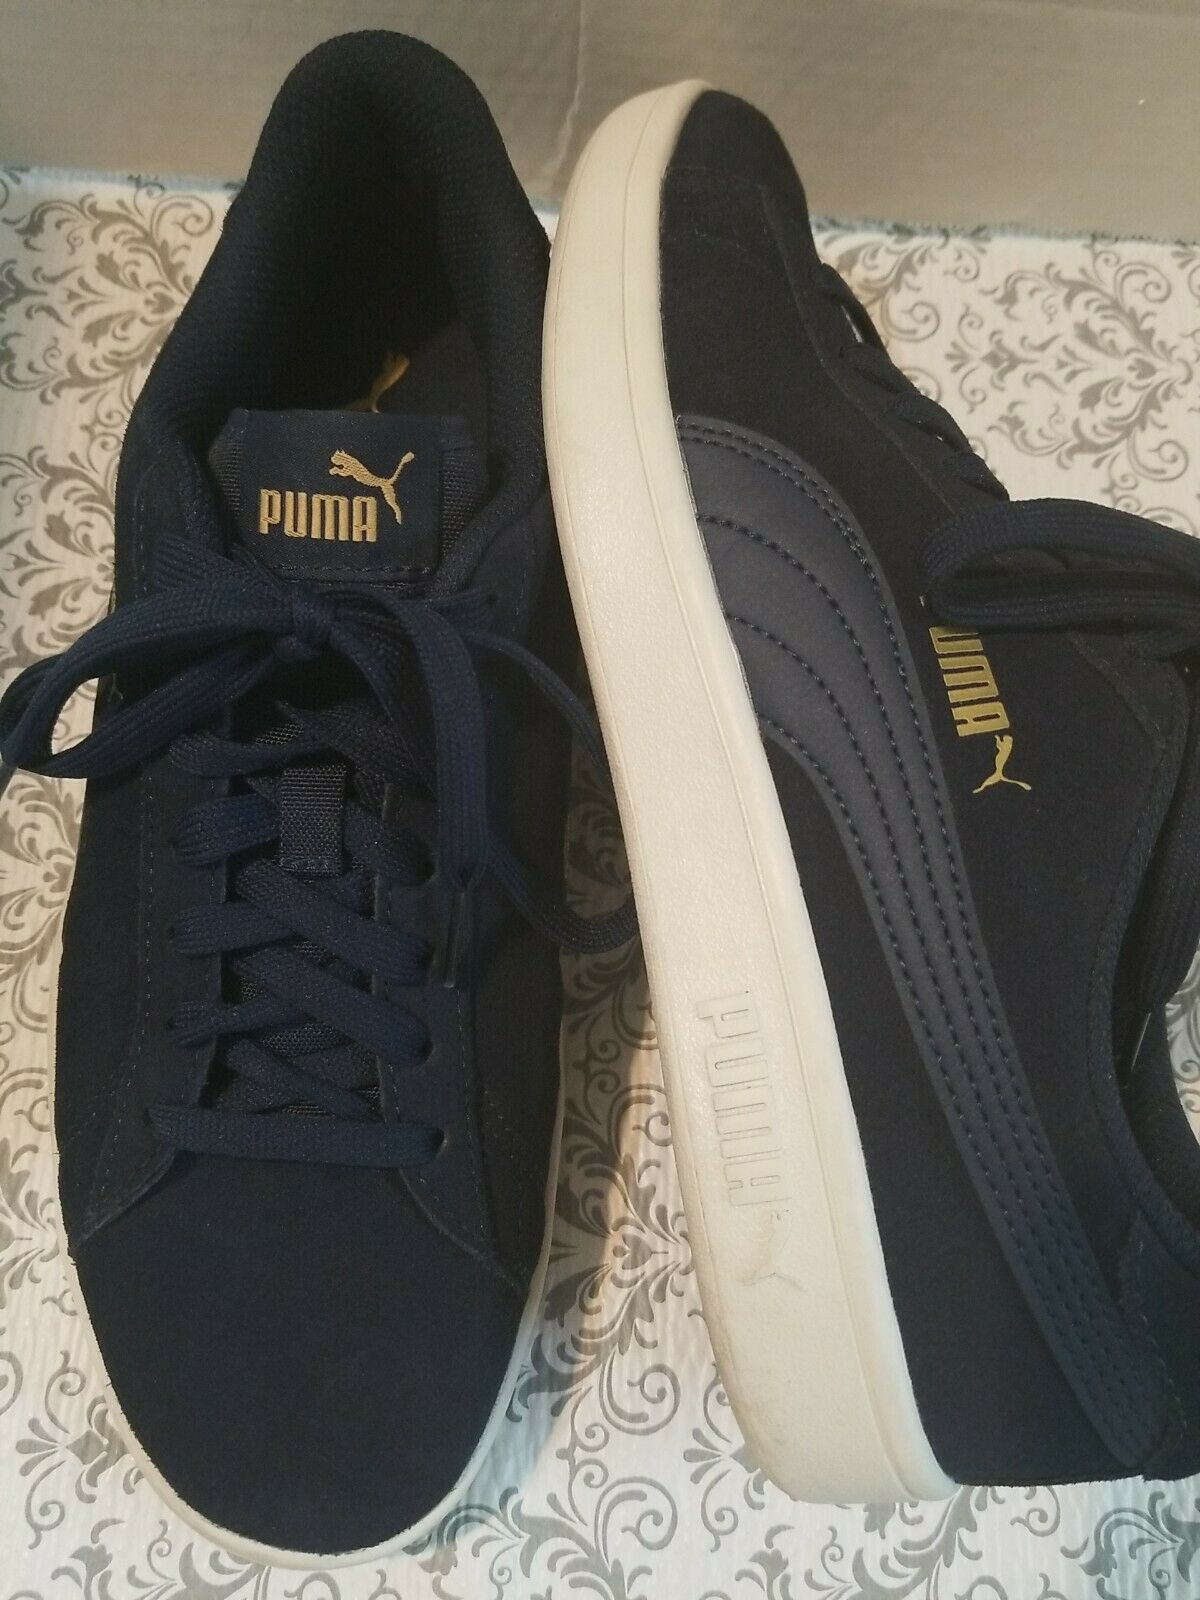 Puma Soft Foam Optimal Confort Smash V2 Men's Sneaker… - Gem